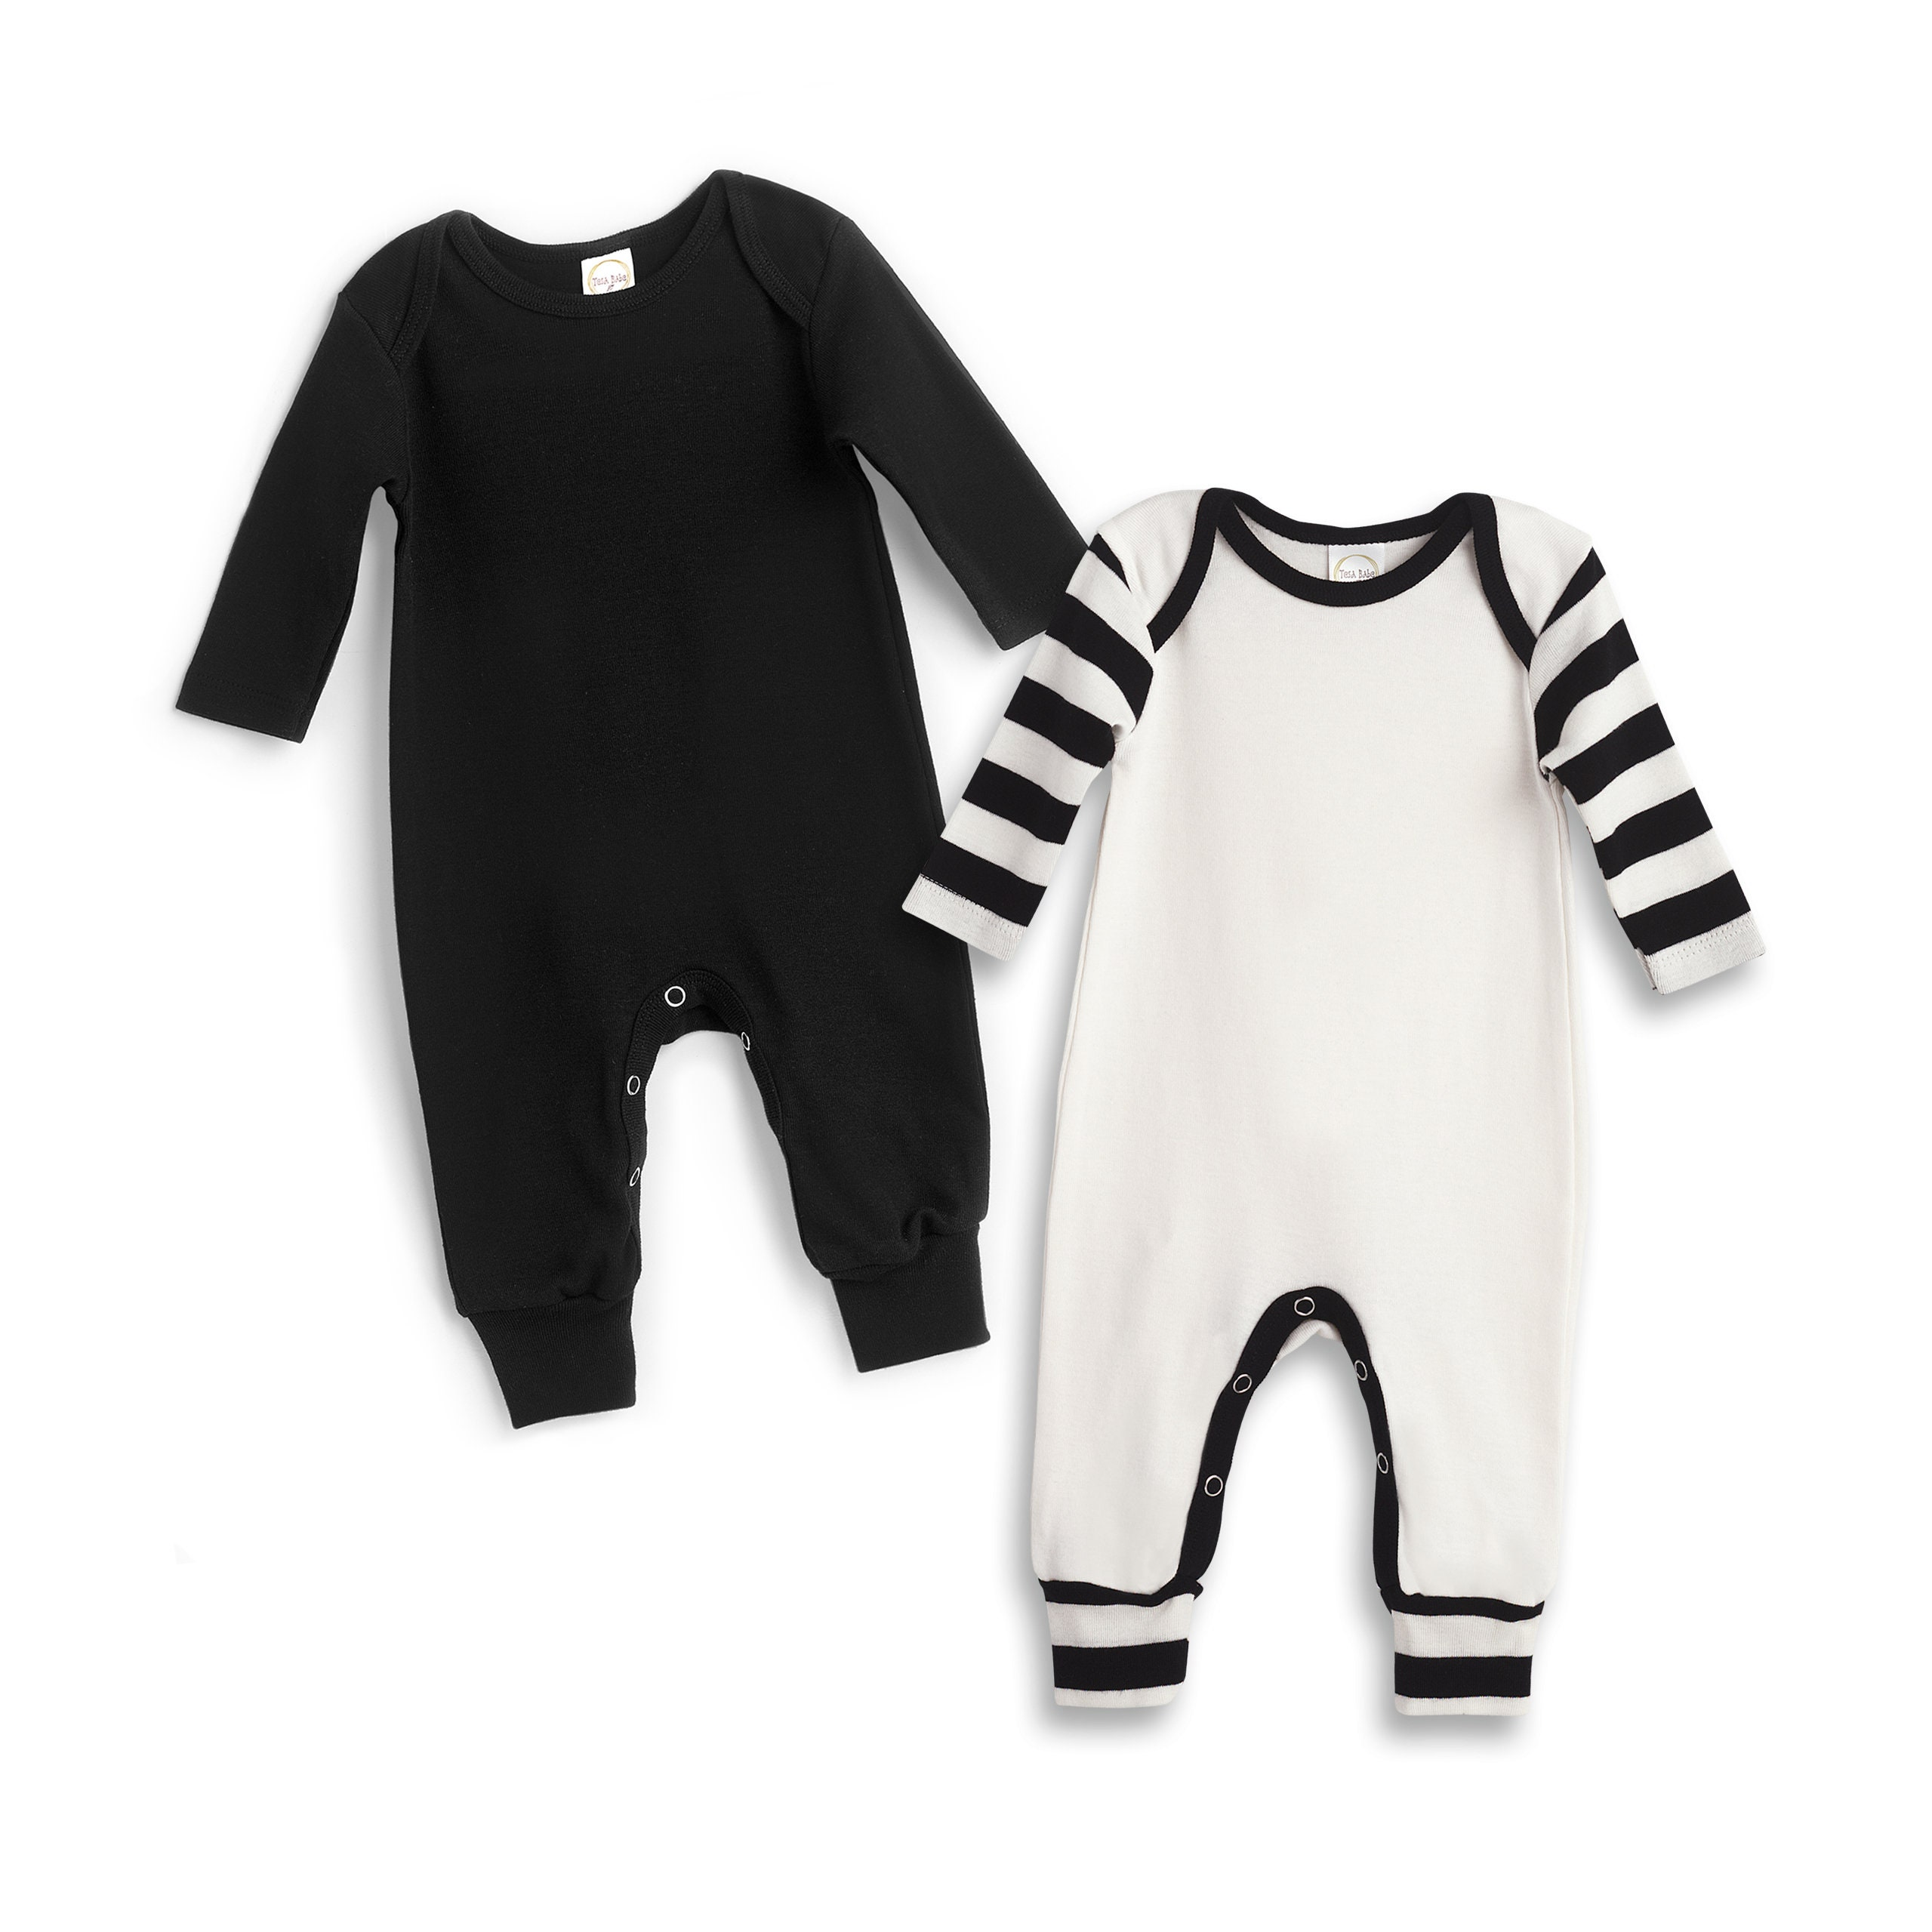 562a0c0111bb Newborn Baby Rompers Black White Set of 2